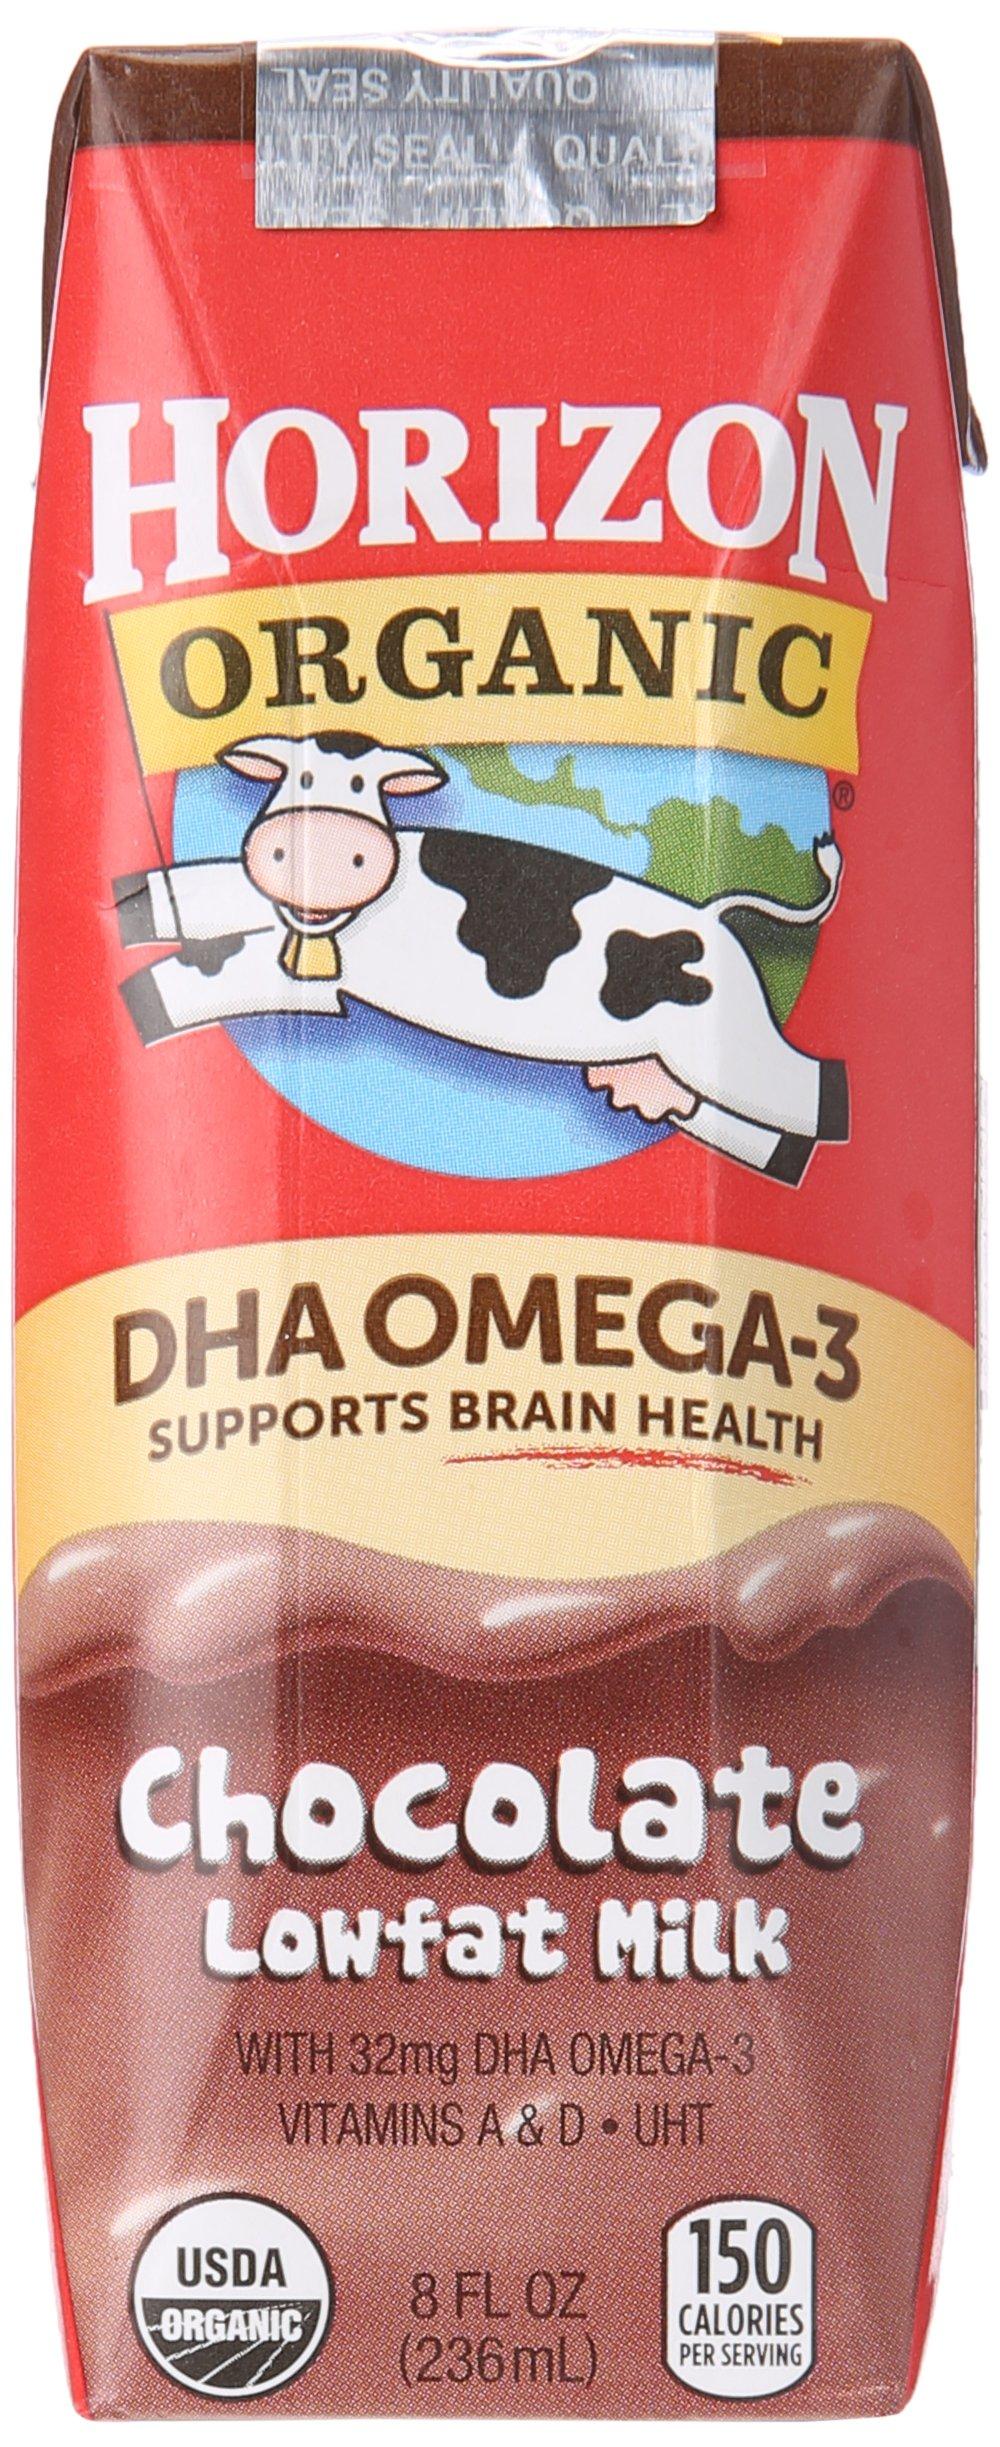 HORIZON Milk 1 Percent Chocolate, 48 oz